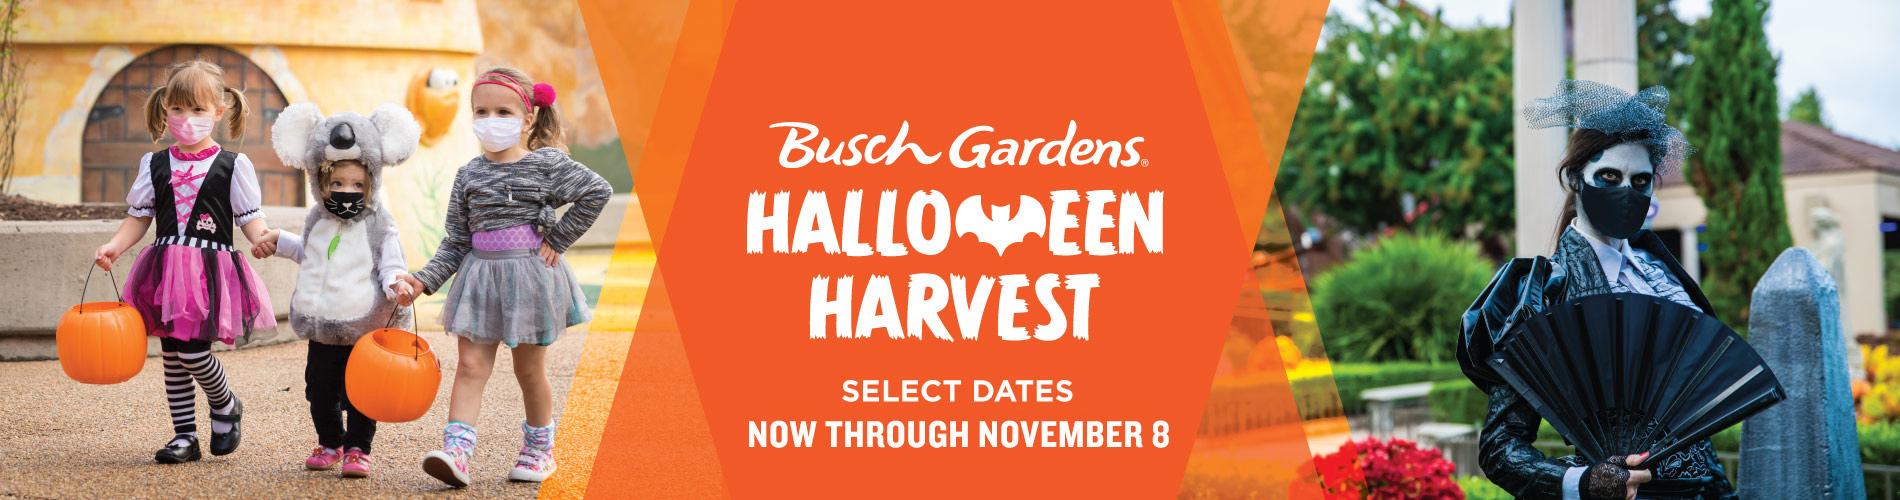 Busch Gardens Halloween Harvest Event - Select Dates, now through November 8